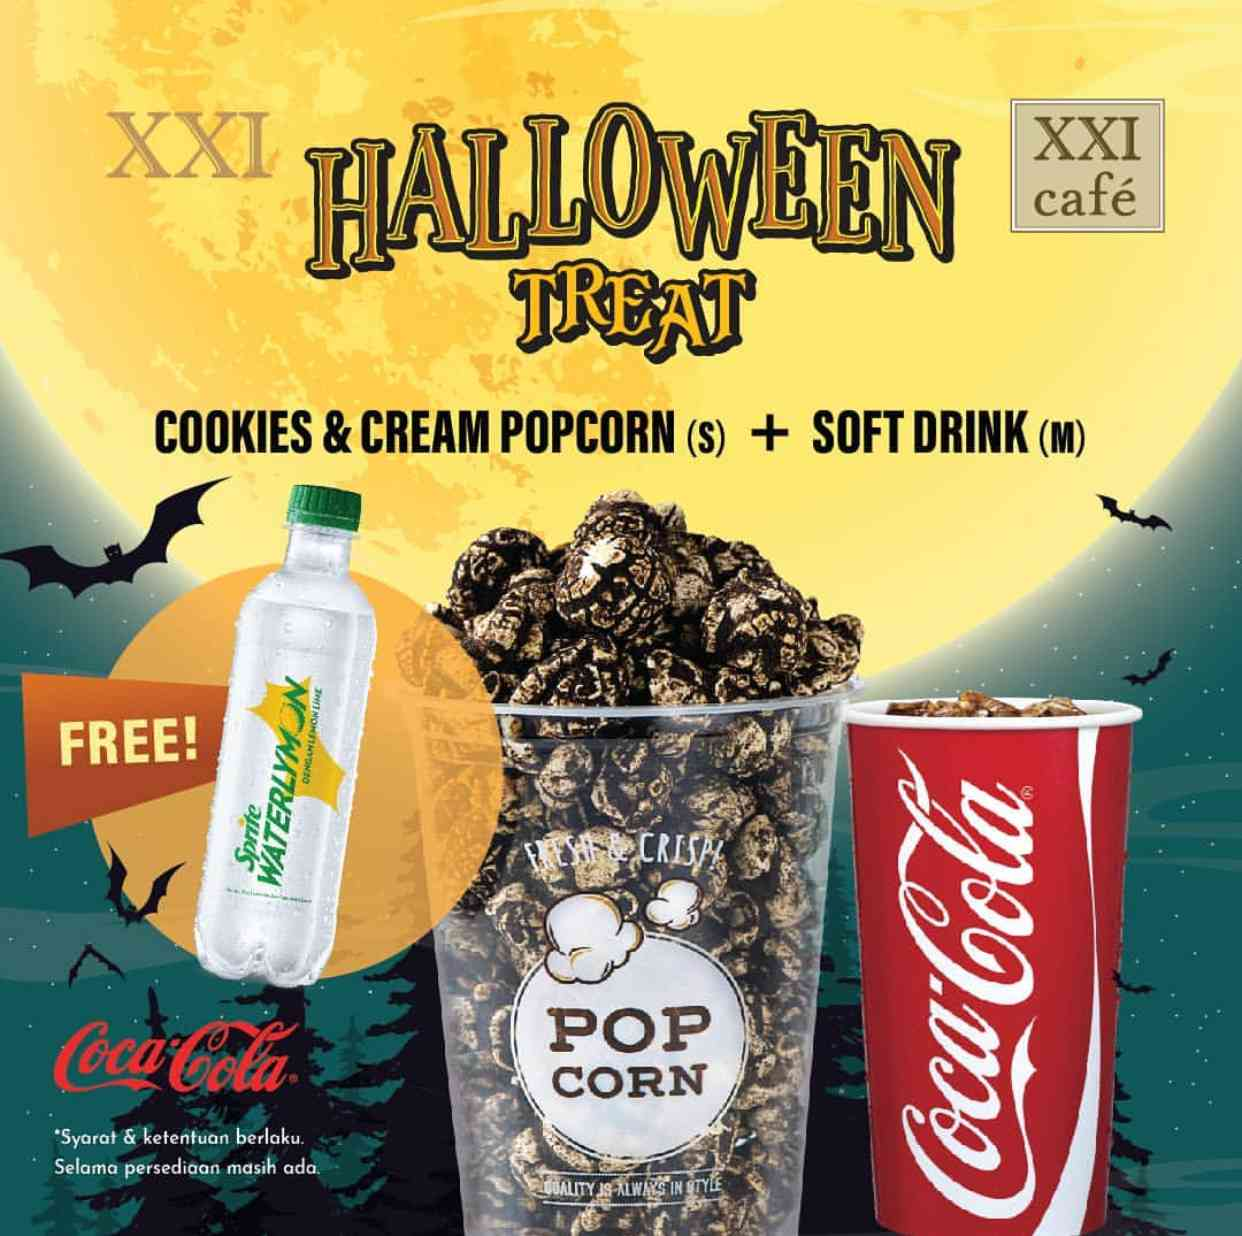 XXI CAFE Promo Halloween Treat Beli Paket Cookies & Cream Popcorn + Soft Drink (m) GRATIS Sprite Wat